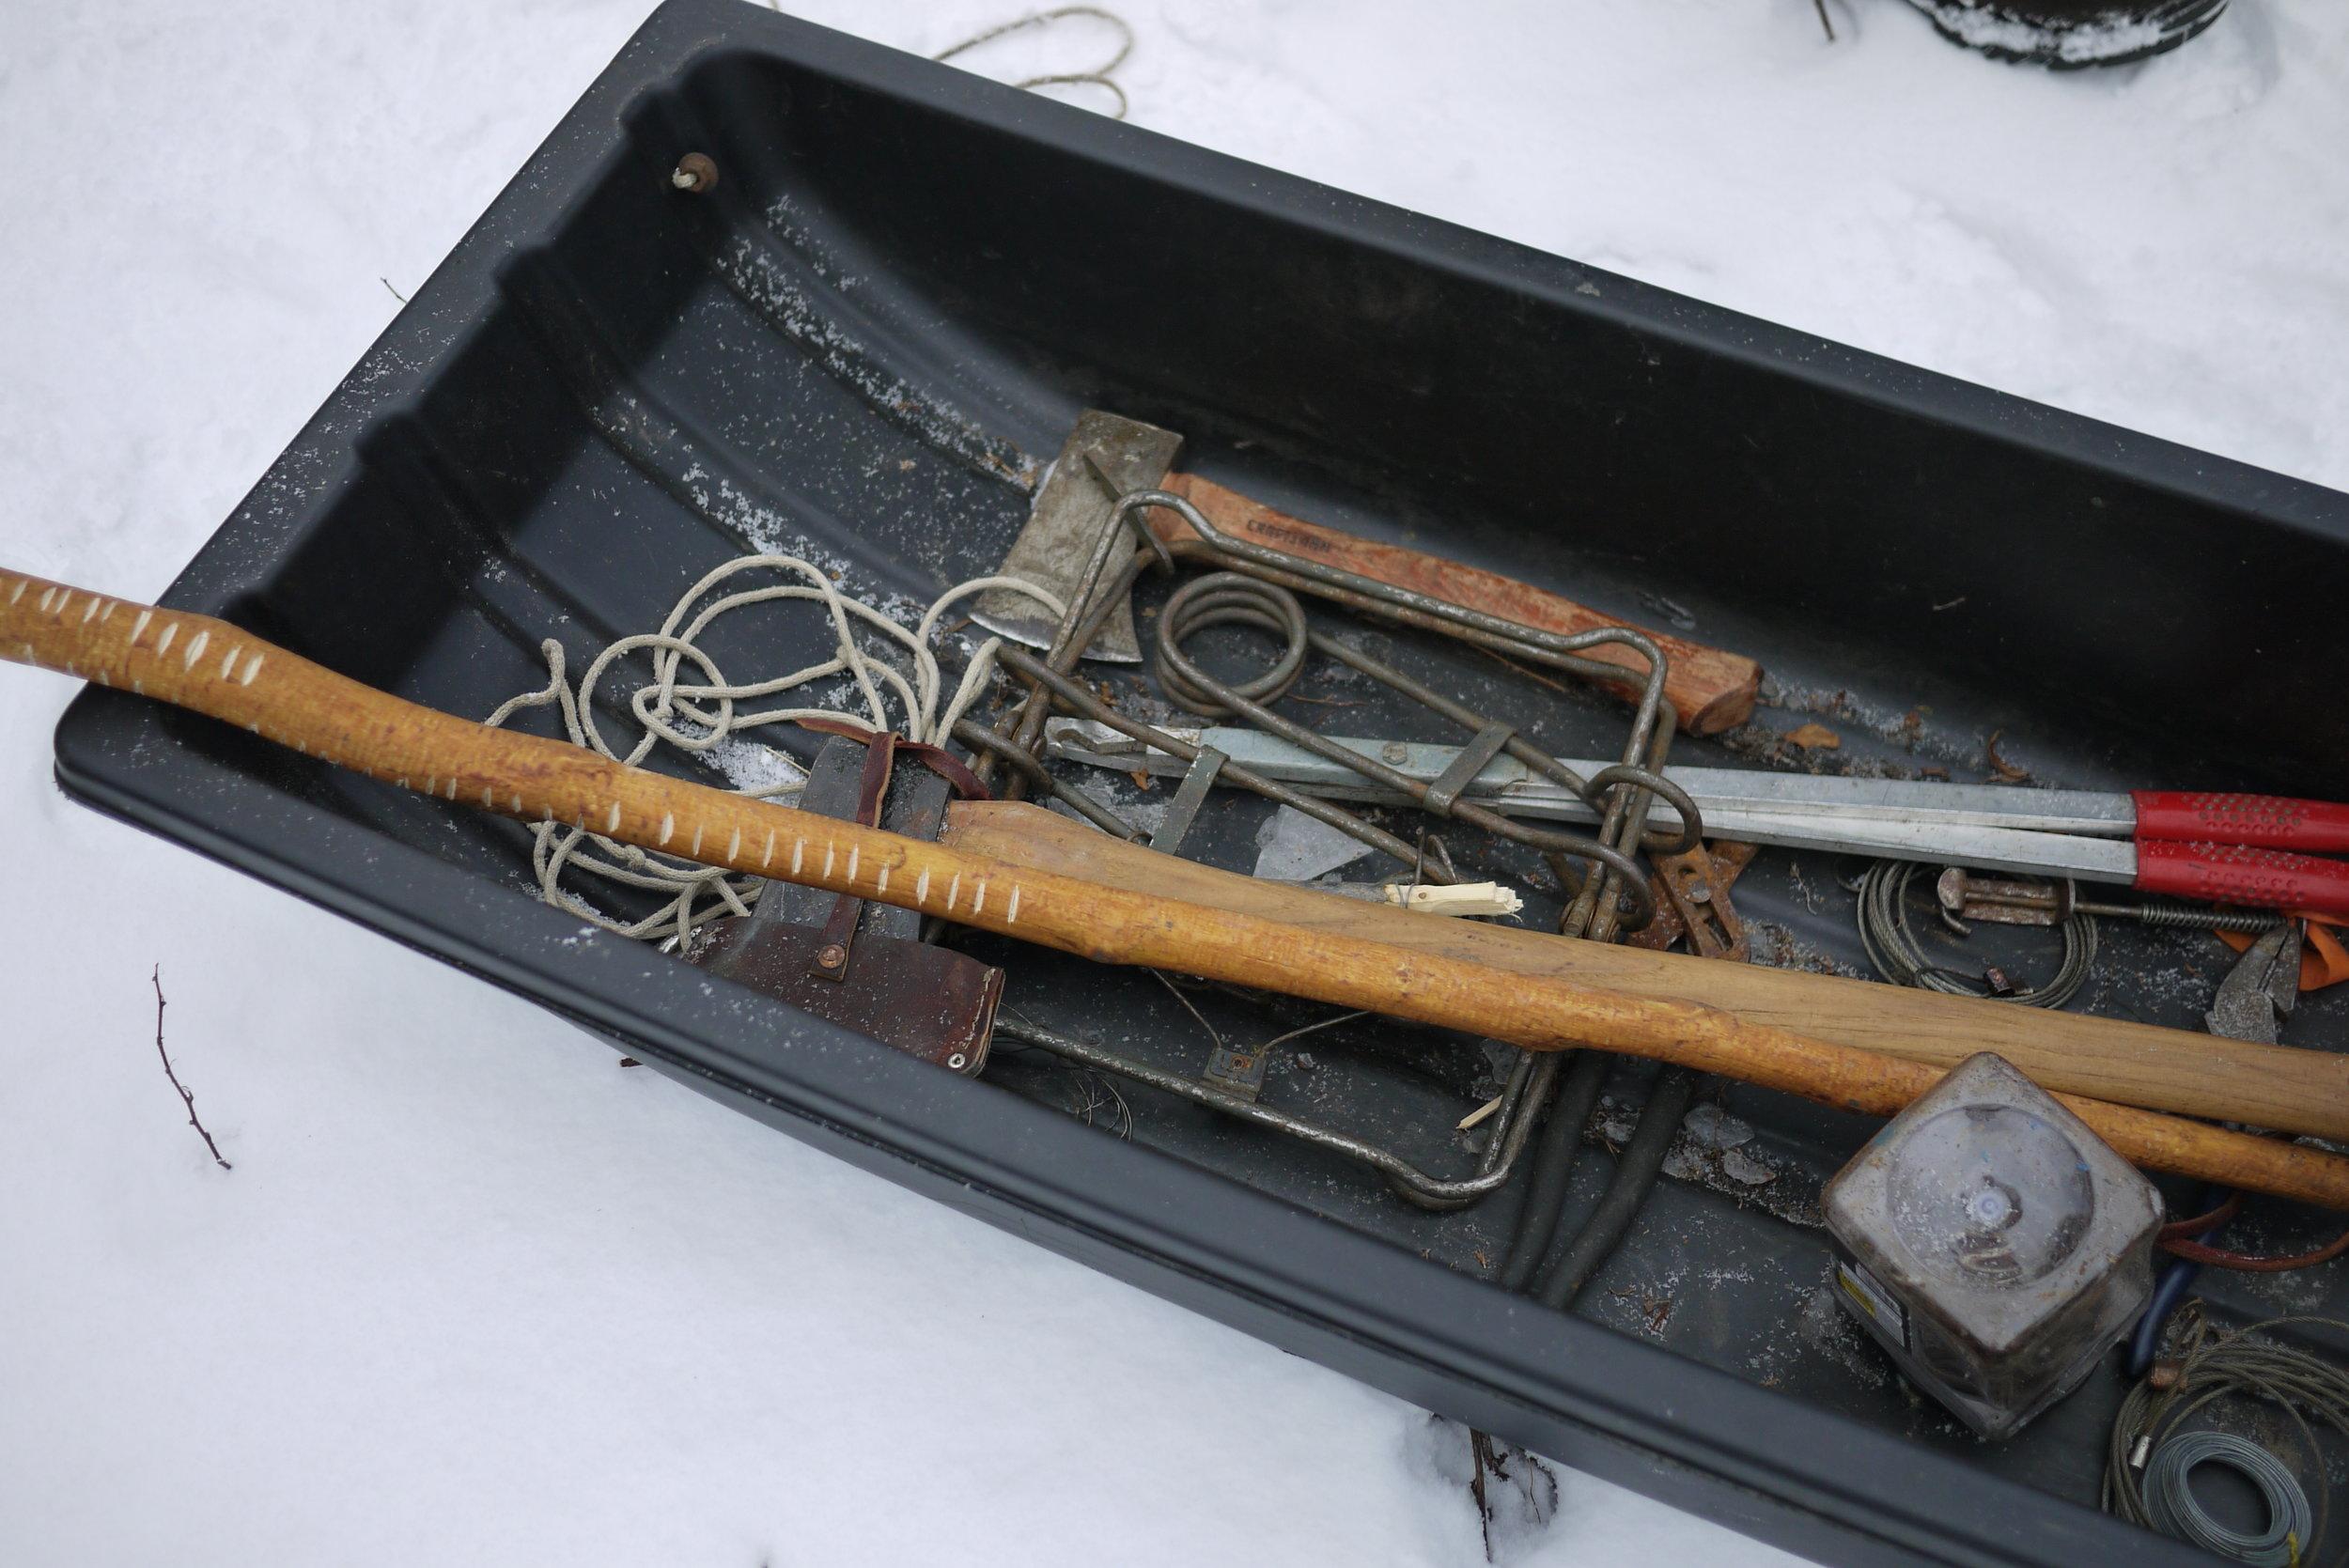 Jeff Traynor's tools.